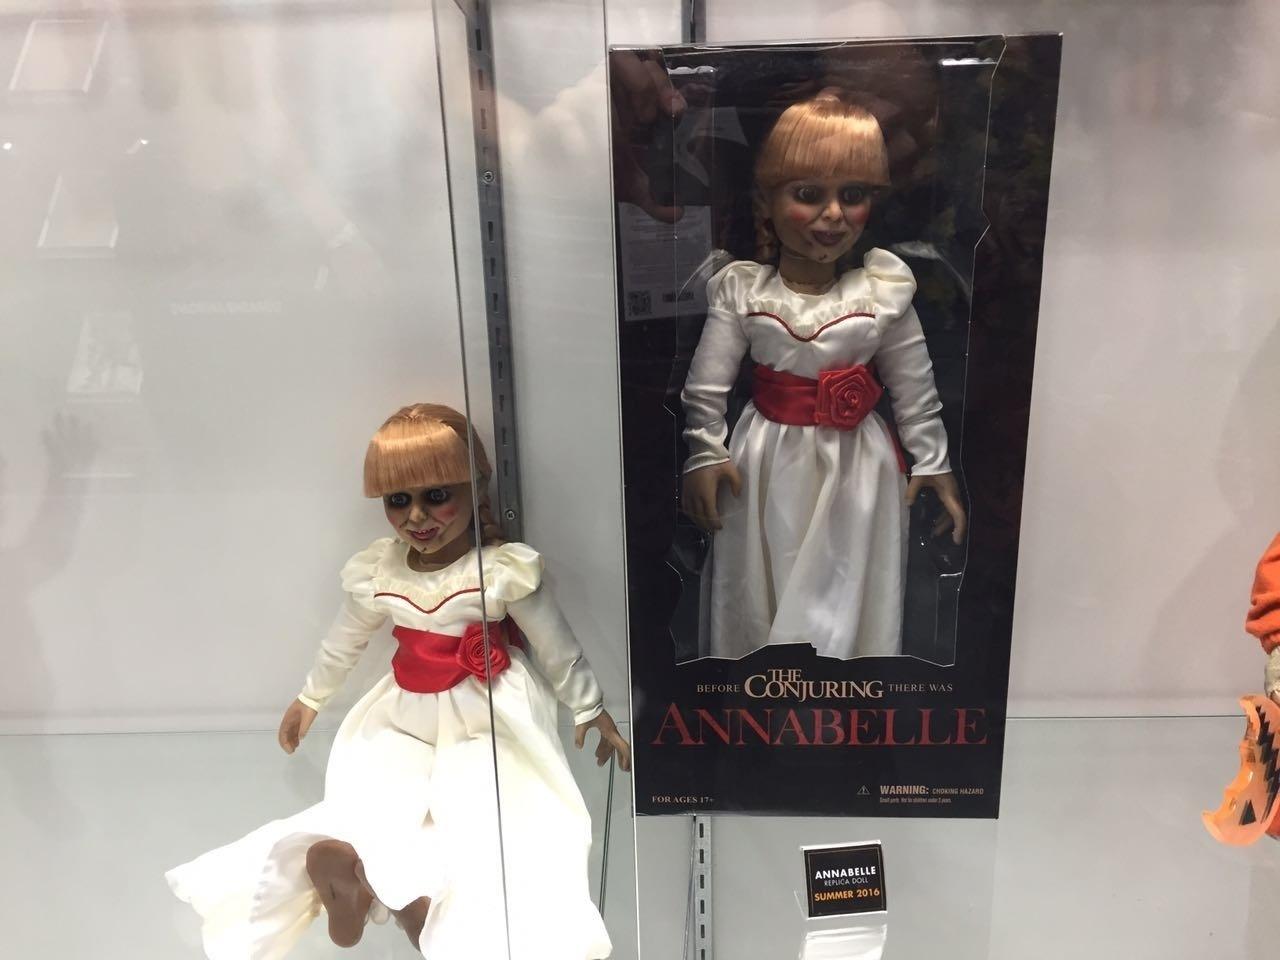 Annabelle e seu vestido é um dos brinquedos exibidos na San Diego Comic-Con 2016